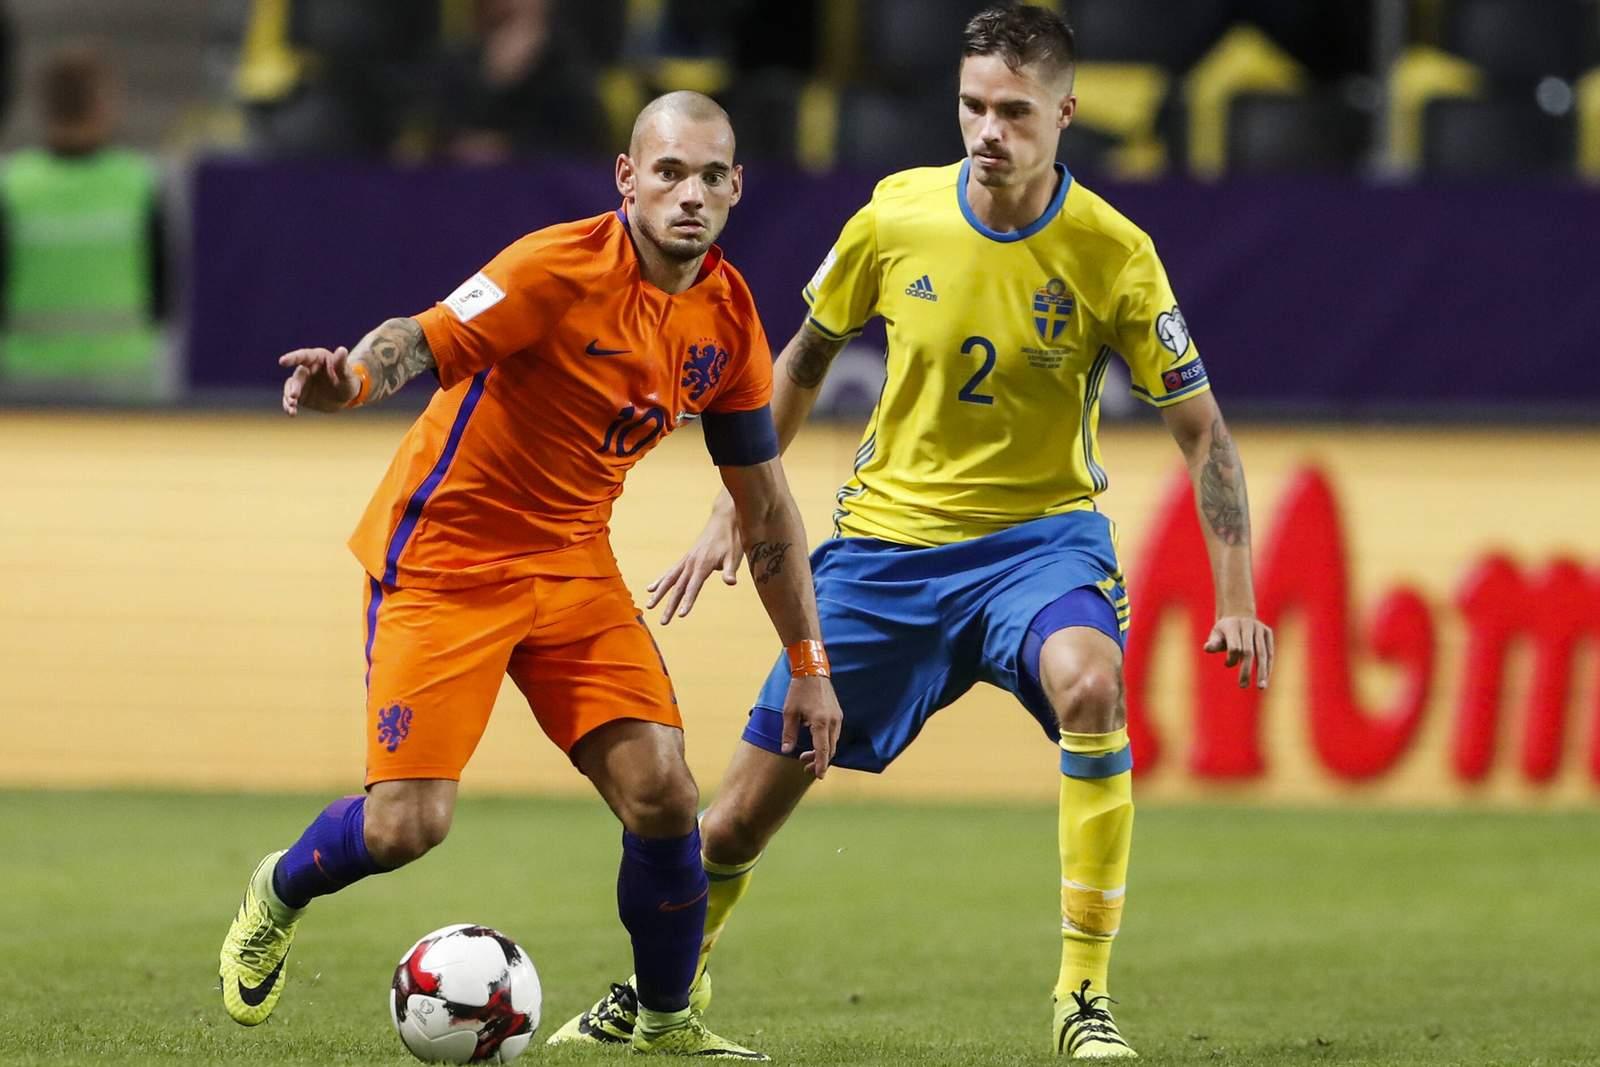 Niederlande Schweden Tipp Quote Prognose 101017